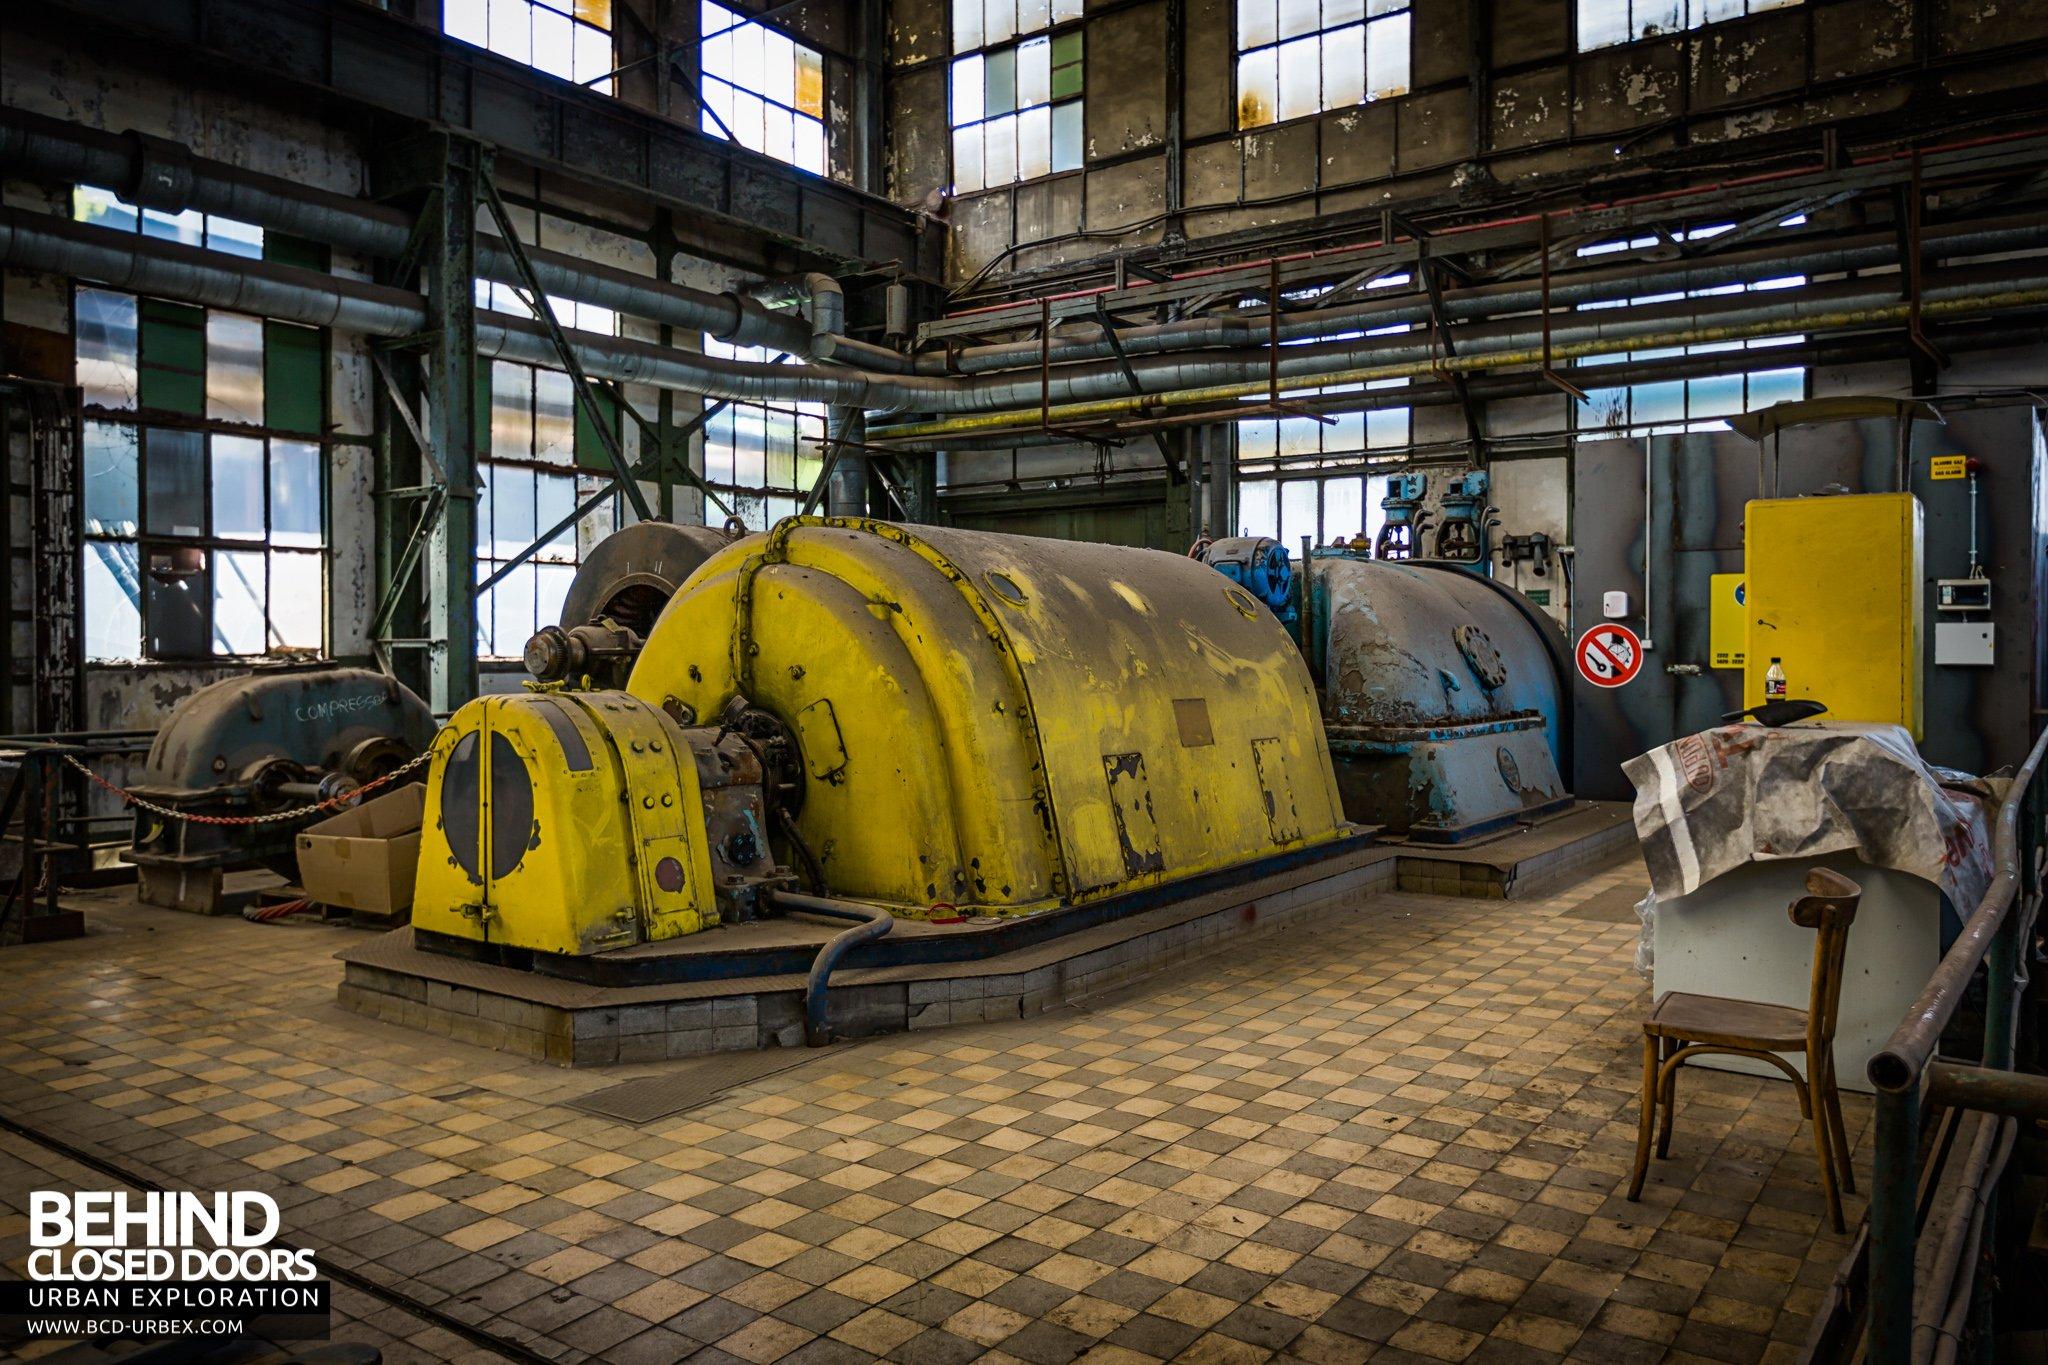 Powerplant X Abandoned Power Station Luxembourg Urbex